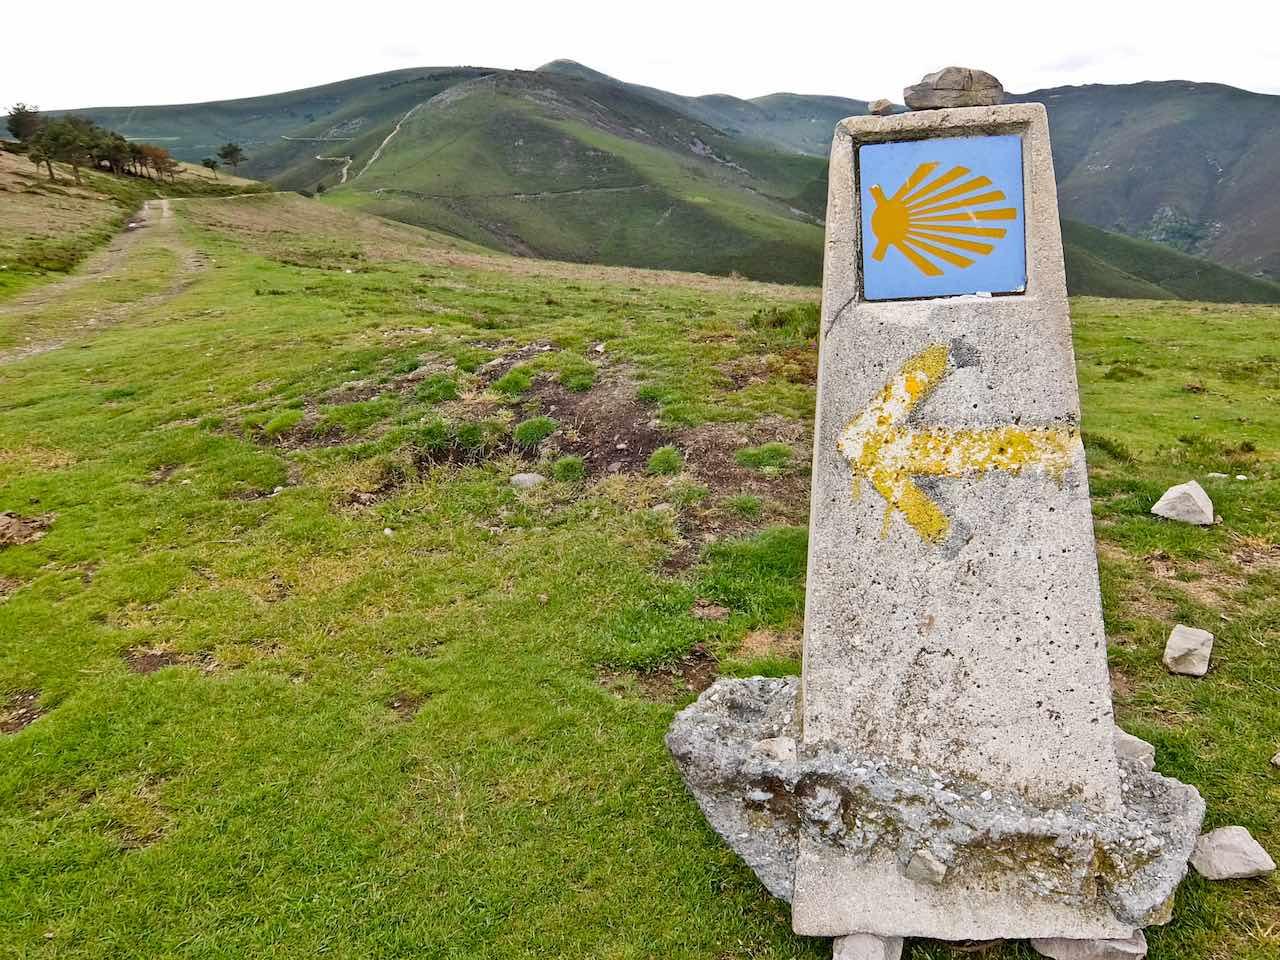 Camino Primitivo - Hospitales Route